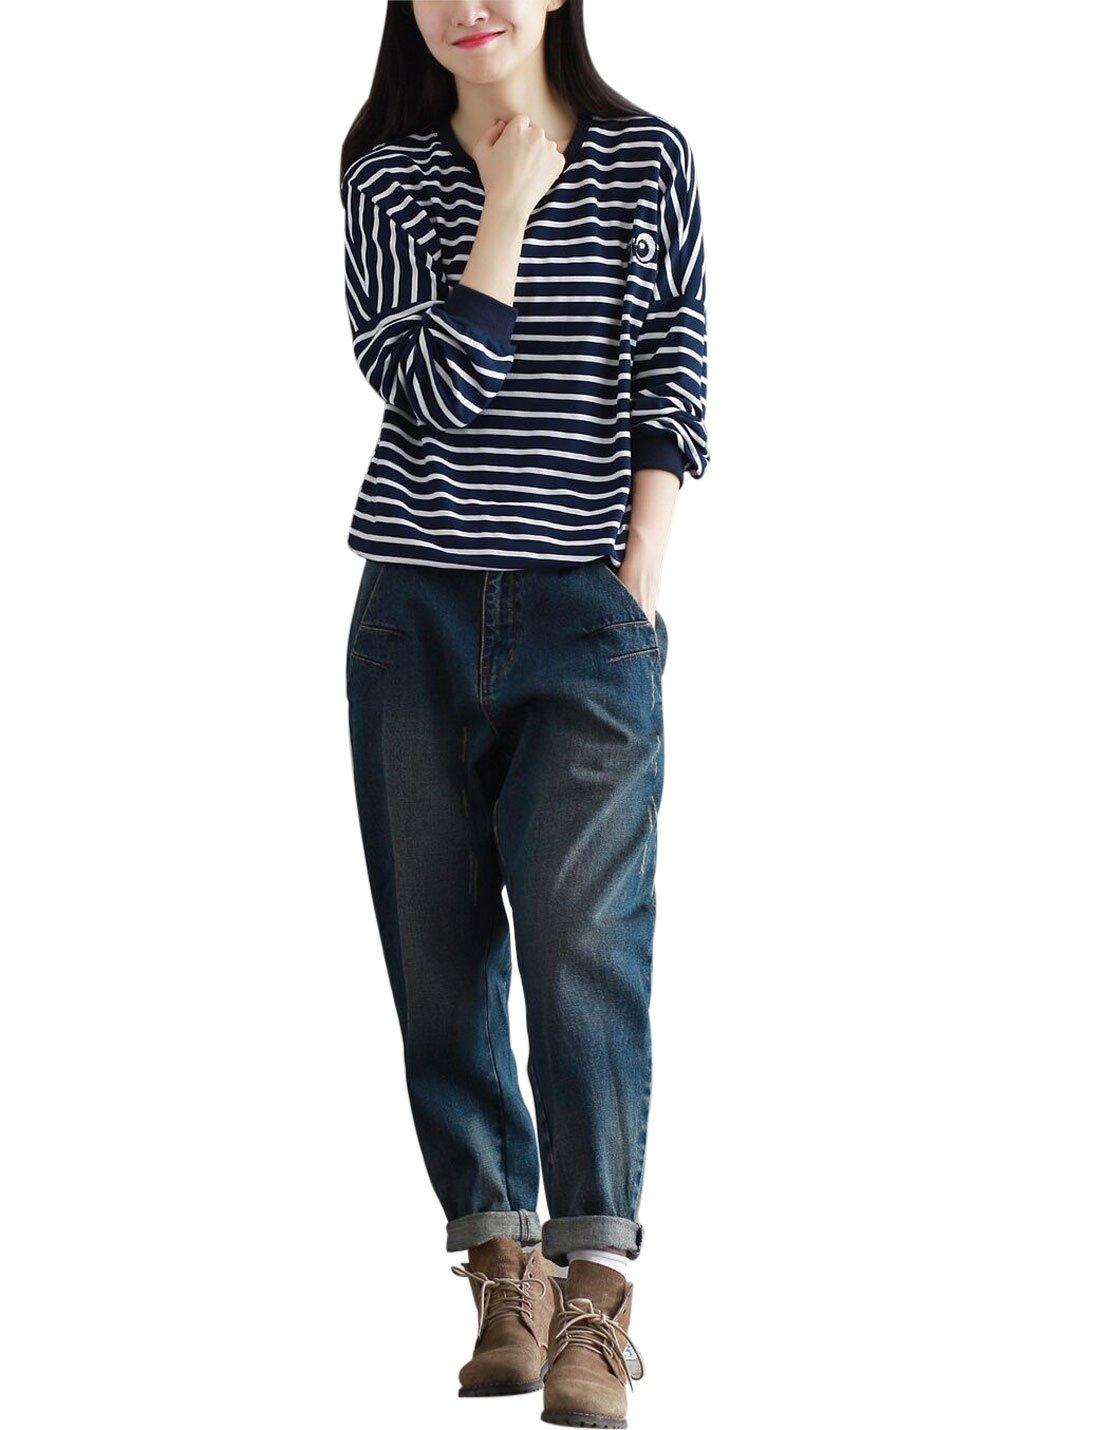 Yeokou Women's Casual Loose Distressed Baggy Harem Denim Jeans Cropped Pants (Large, Dark Blue) by Yeokou (Image #3)